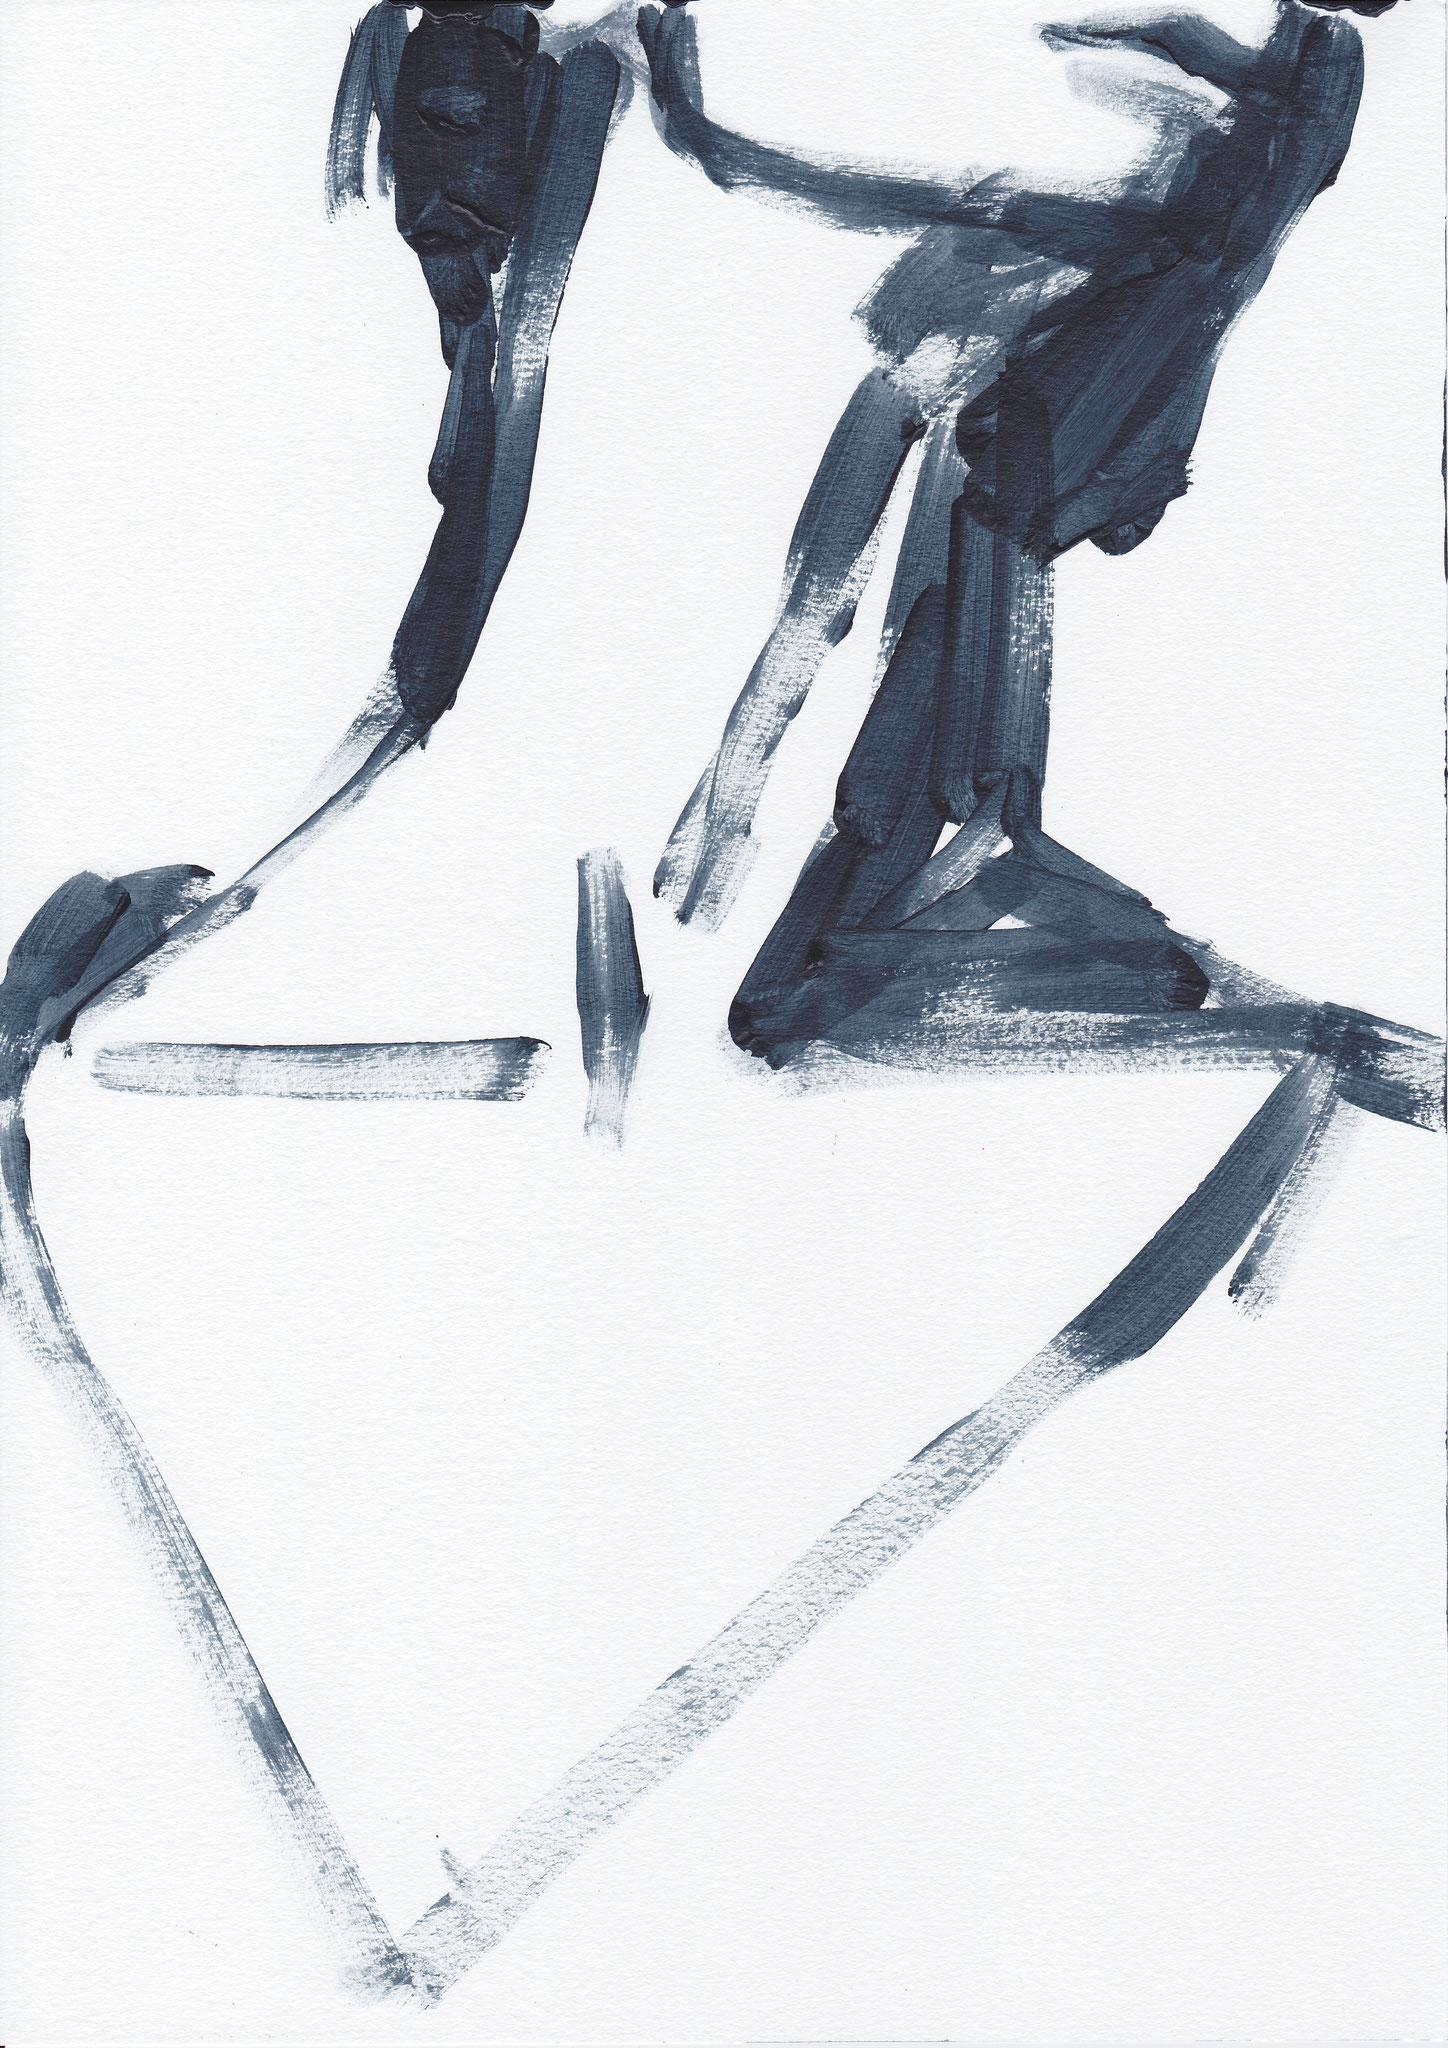 052 , acrylic on paper , 29.7 x 21cm , Selina Saranova